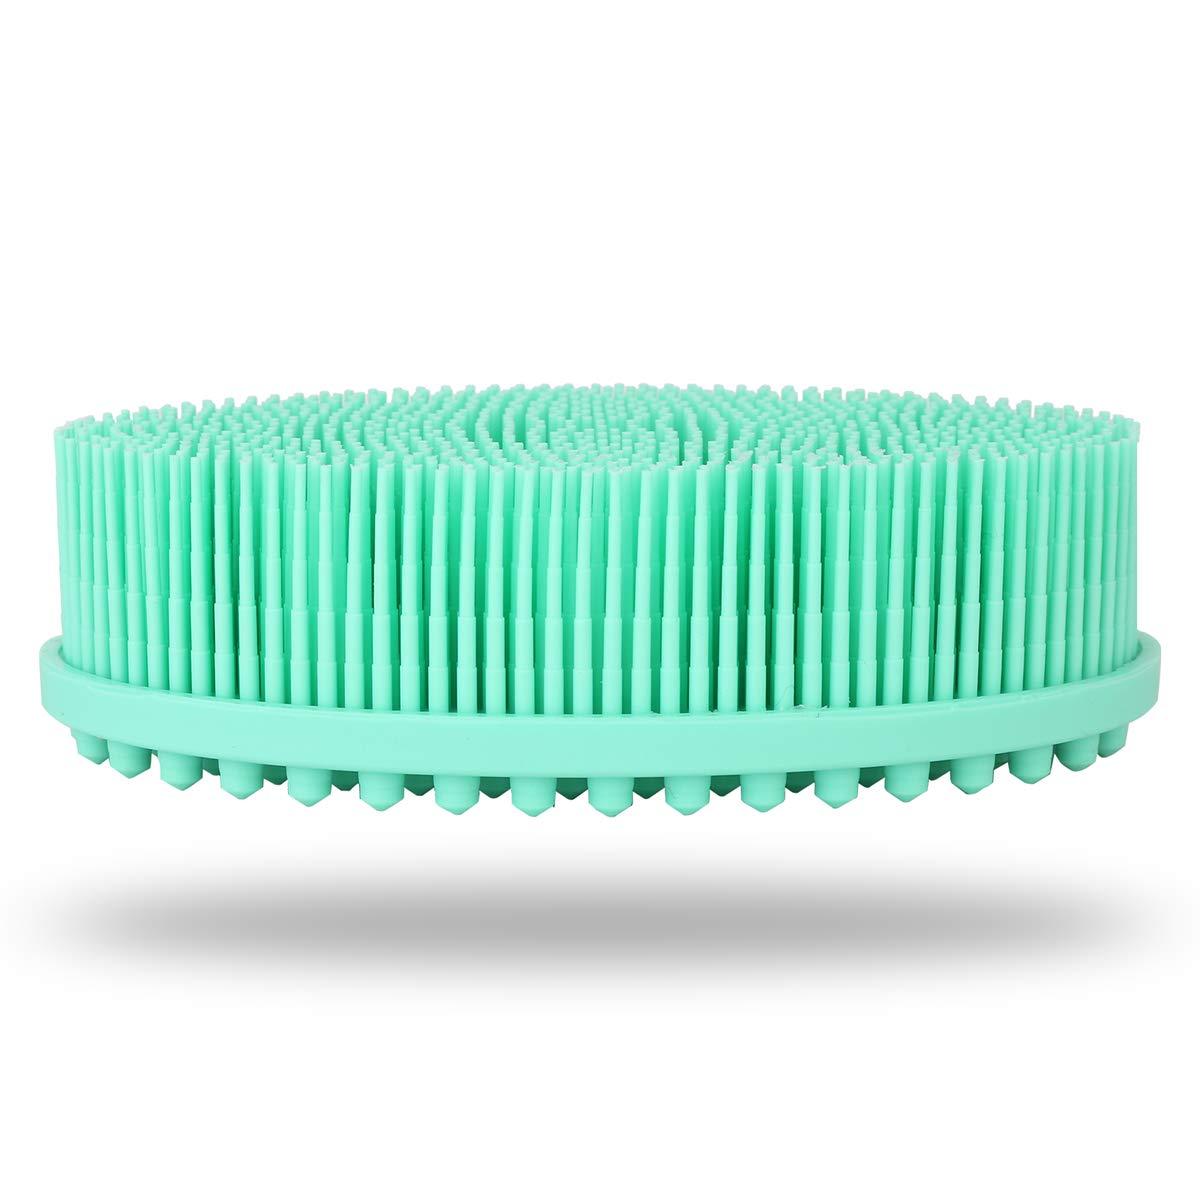 latest Soft Silicone Recommendation Shower Brush Body Wash Loofah Ski Exfoliating Bath